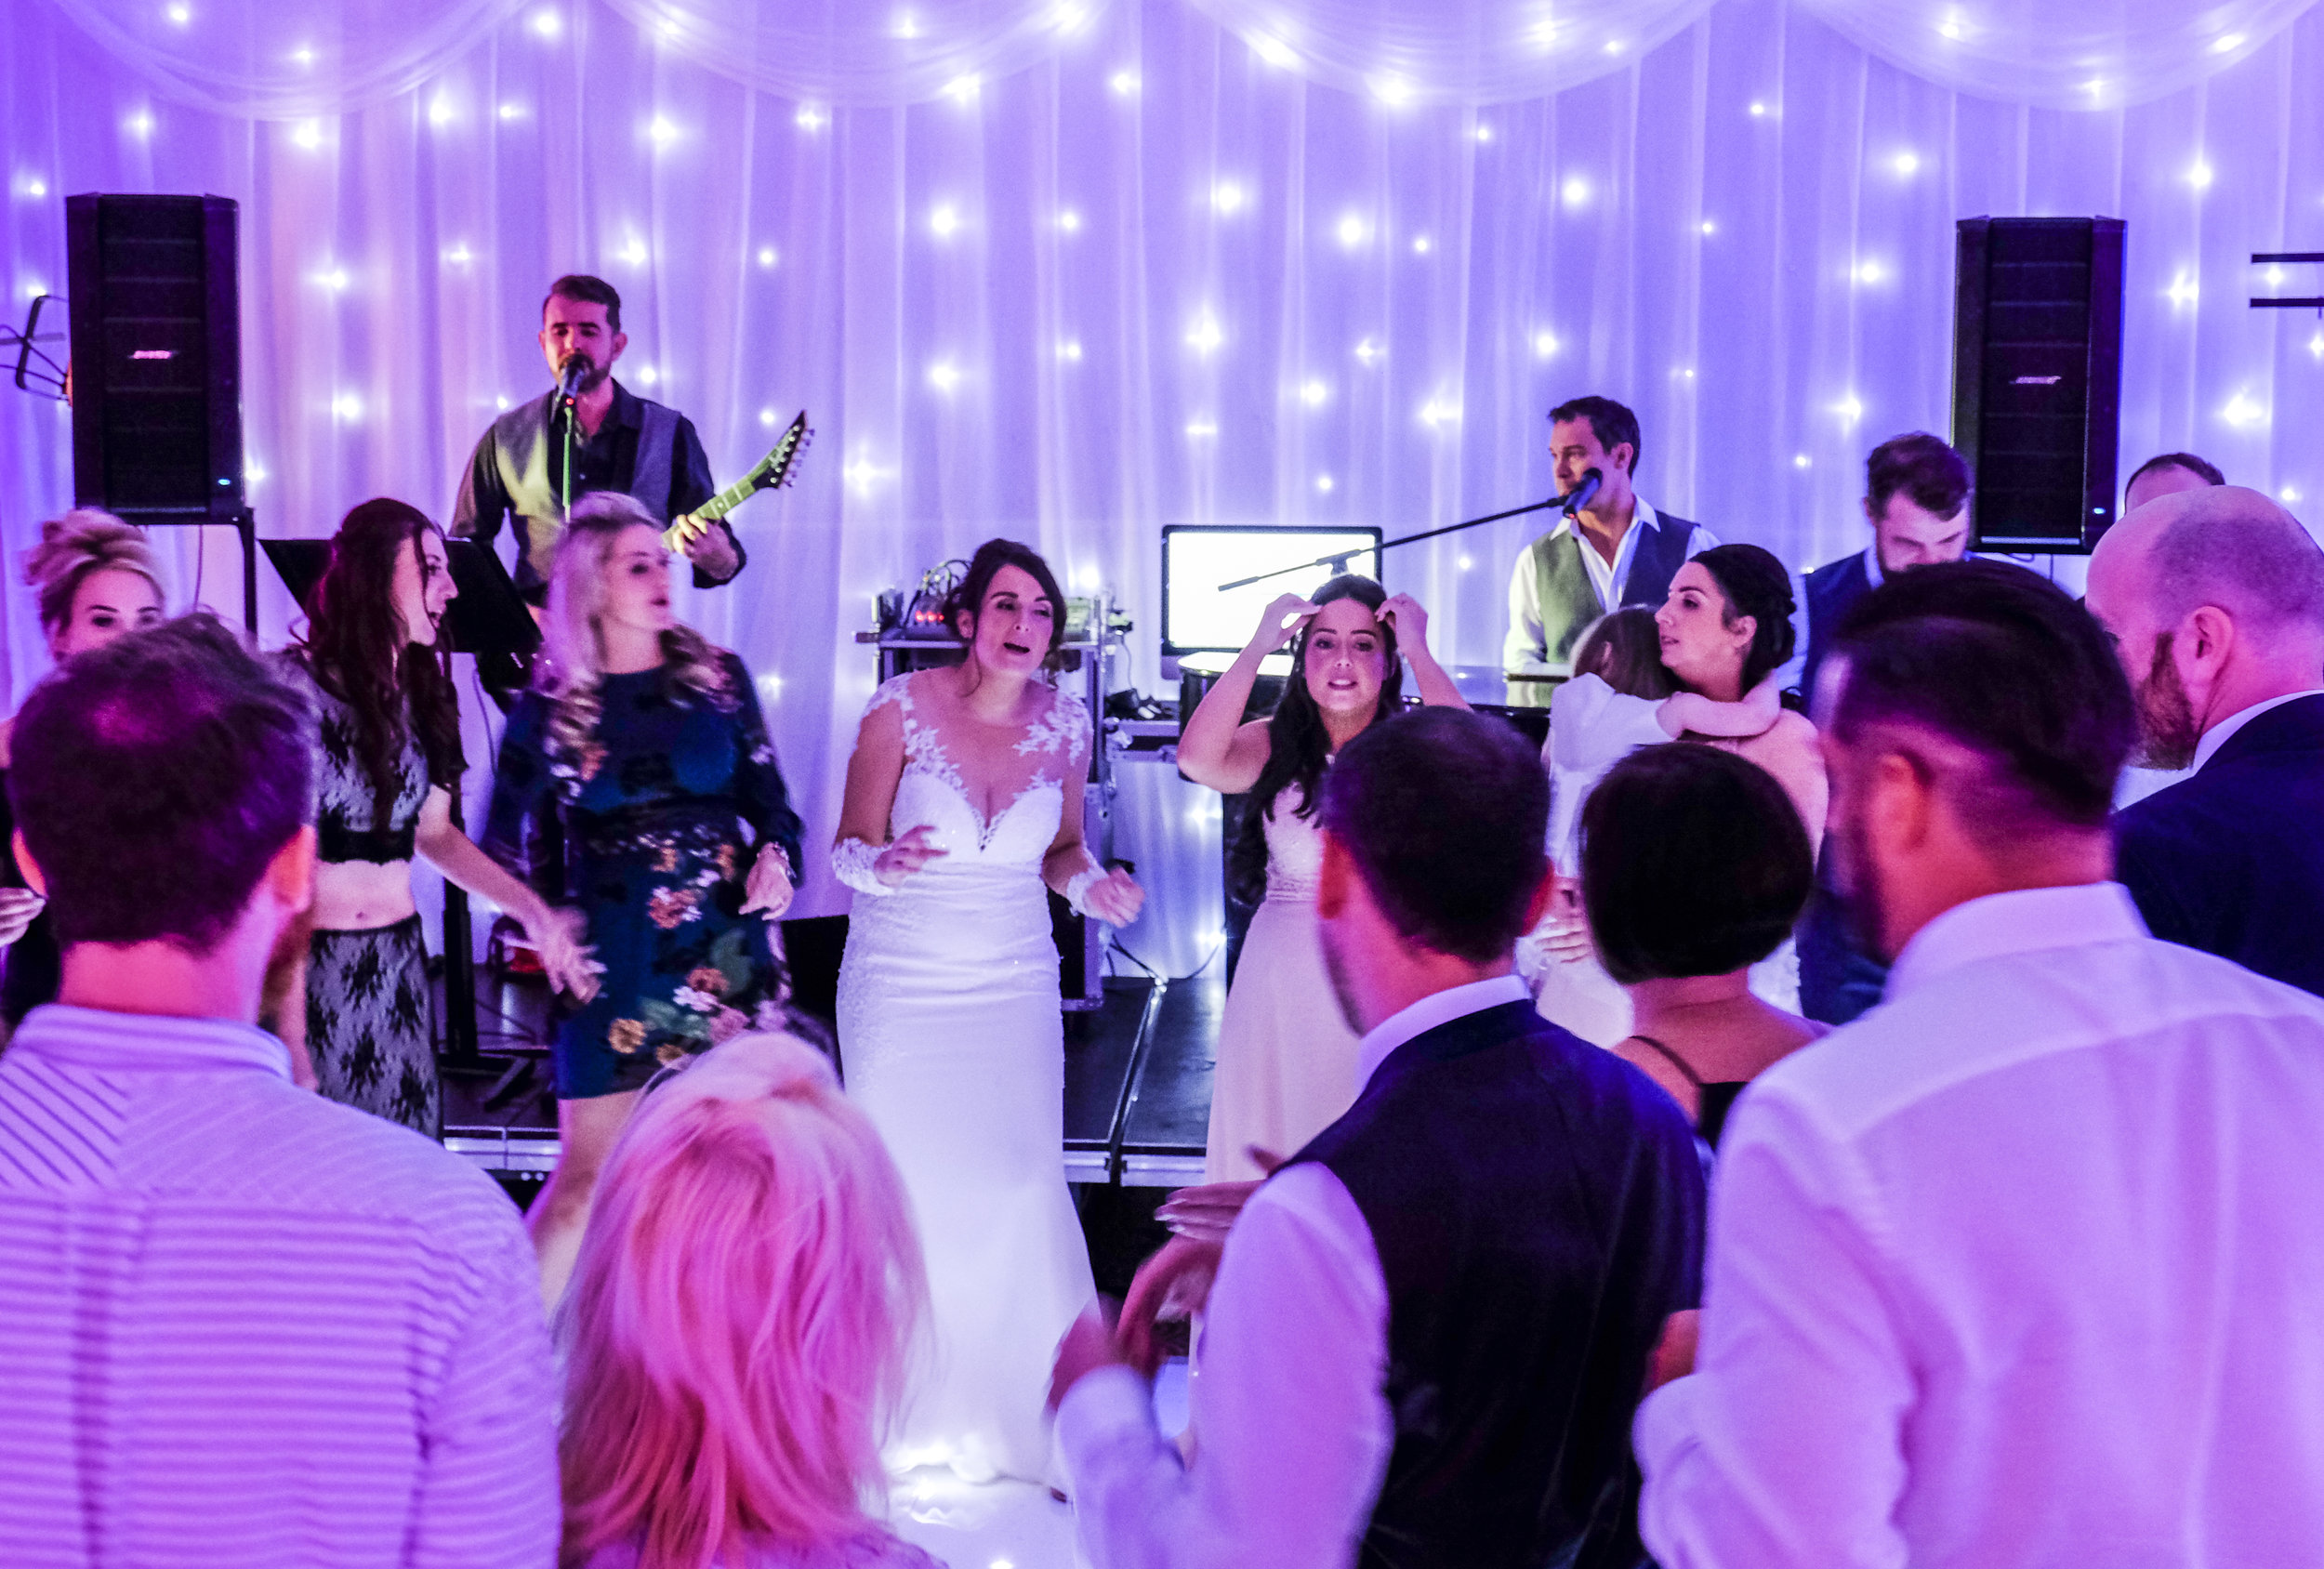 rock revolution red event wedding fayres Liverpool wedding supplier6.JPG